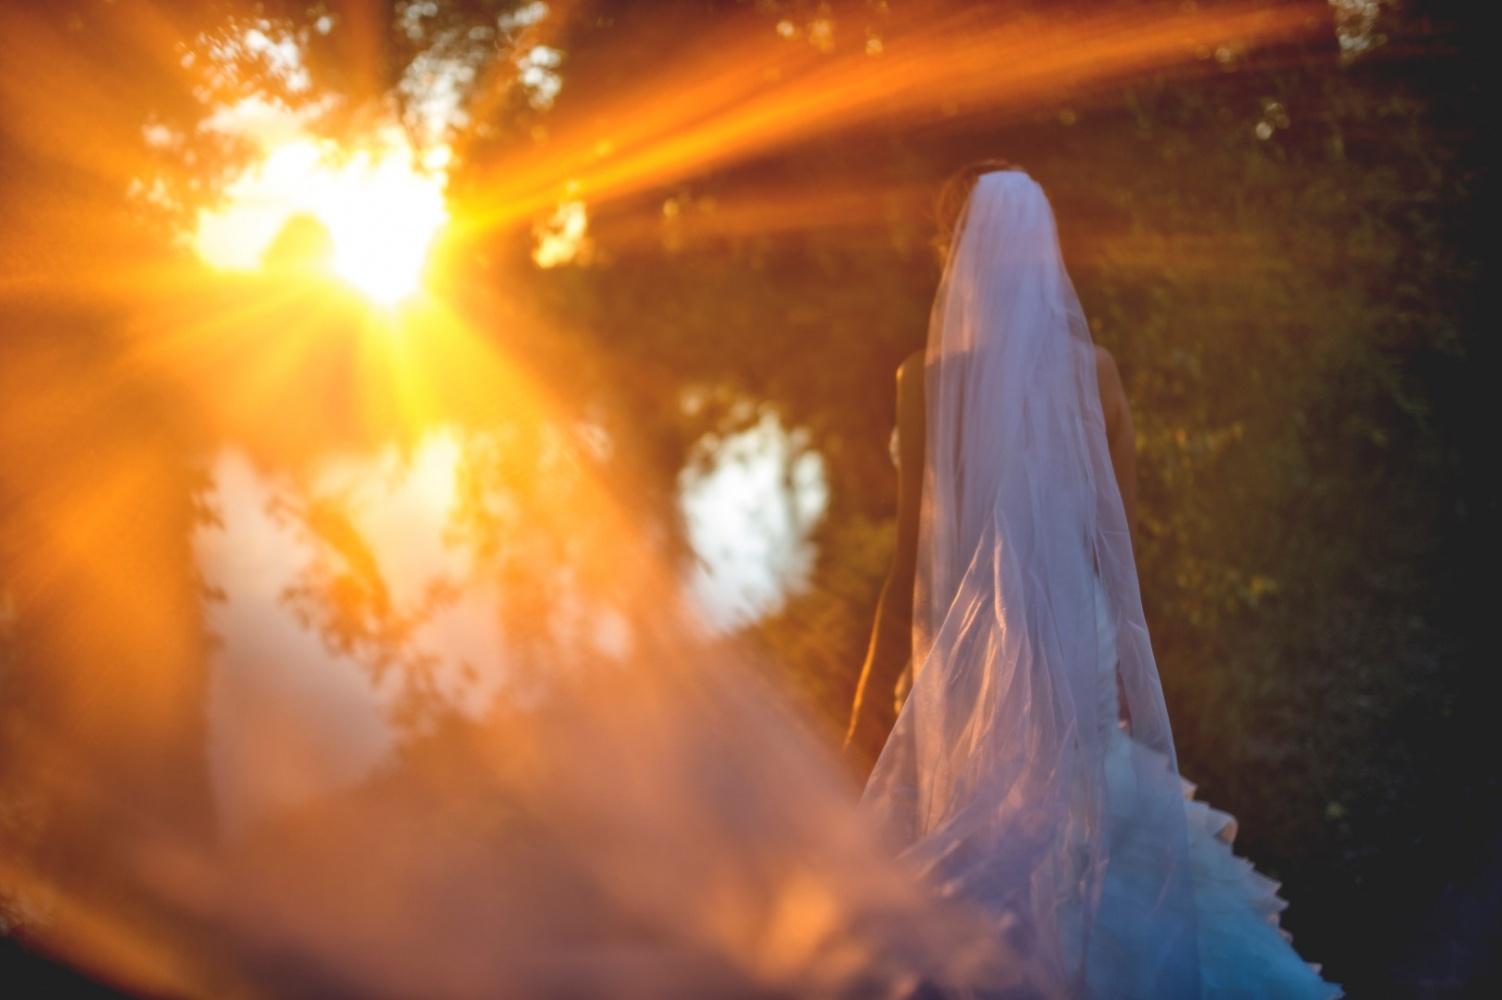 http://www.fotoz.sk/images/gallery-29/normal/eskuvo_vintop-karko_001.jpg